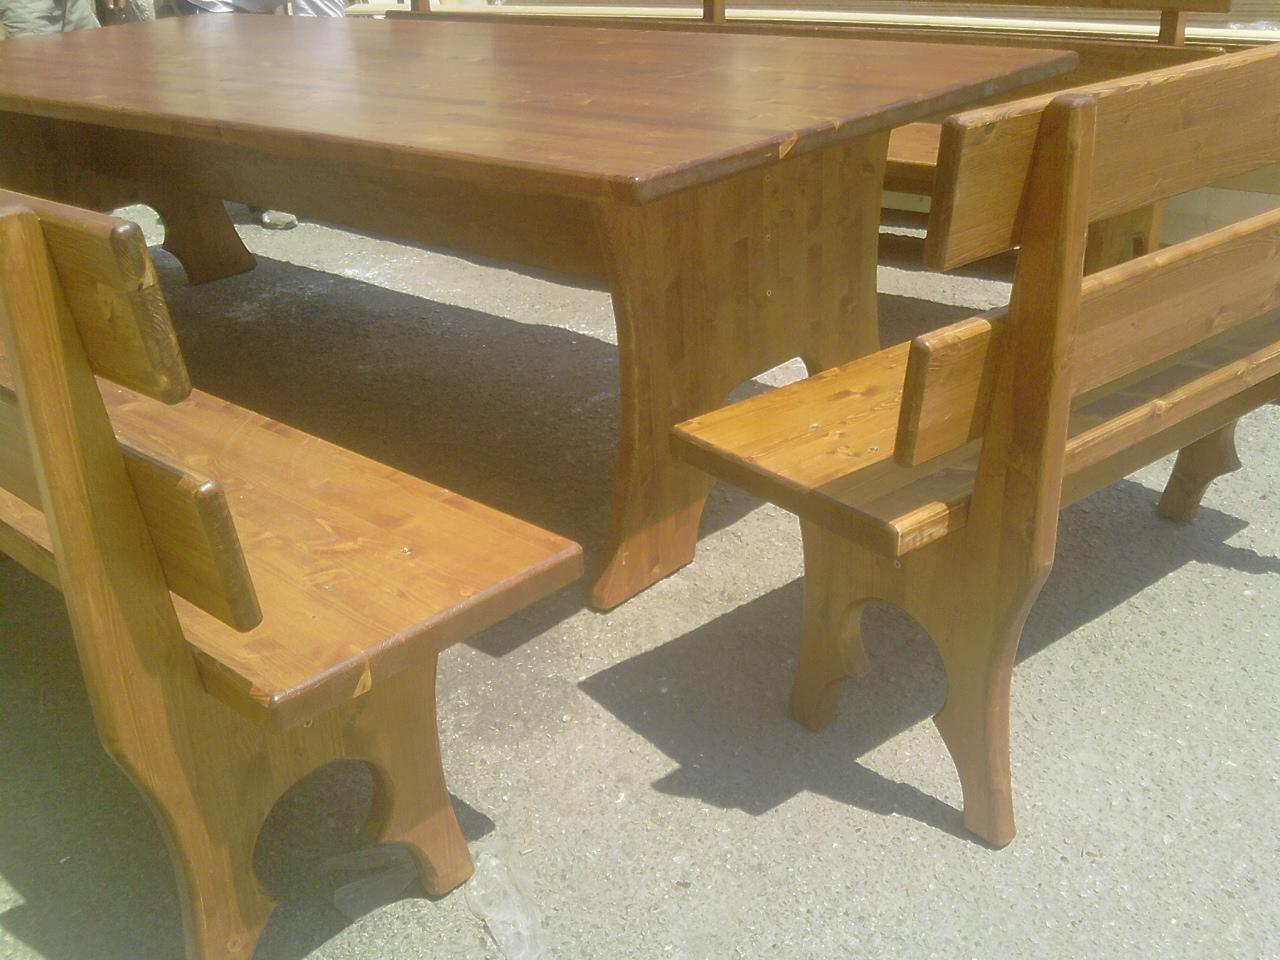 Fai da te hobby legno arredamento per giardino - Arredamento per giardino ...